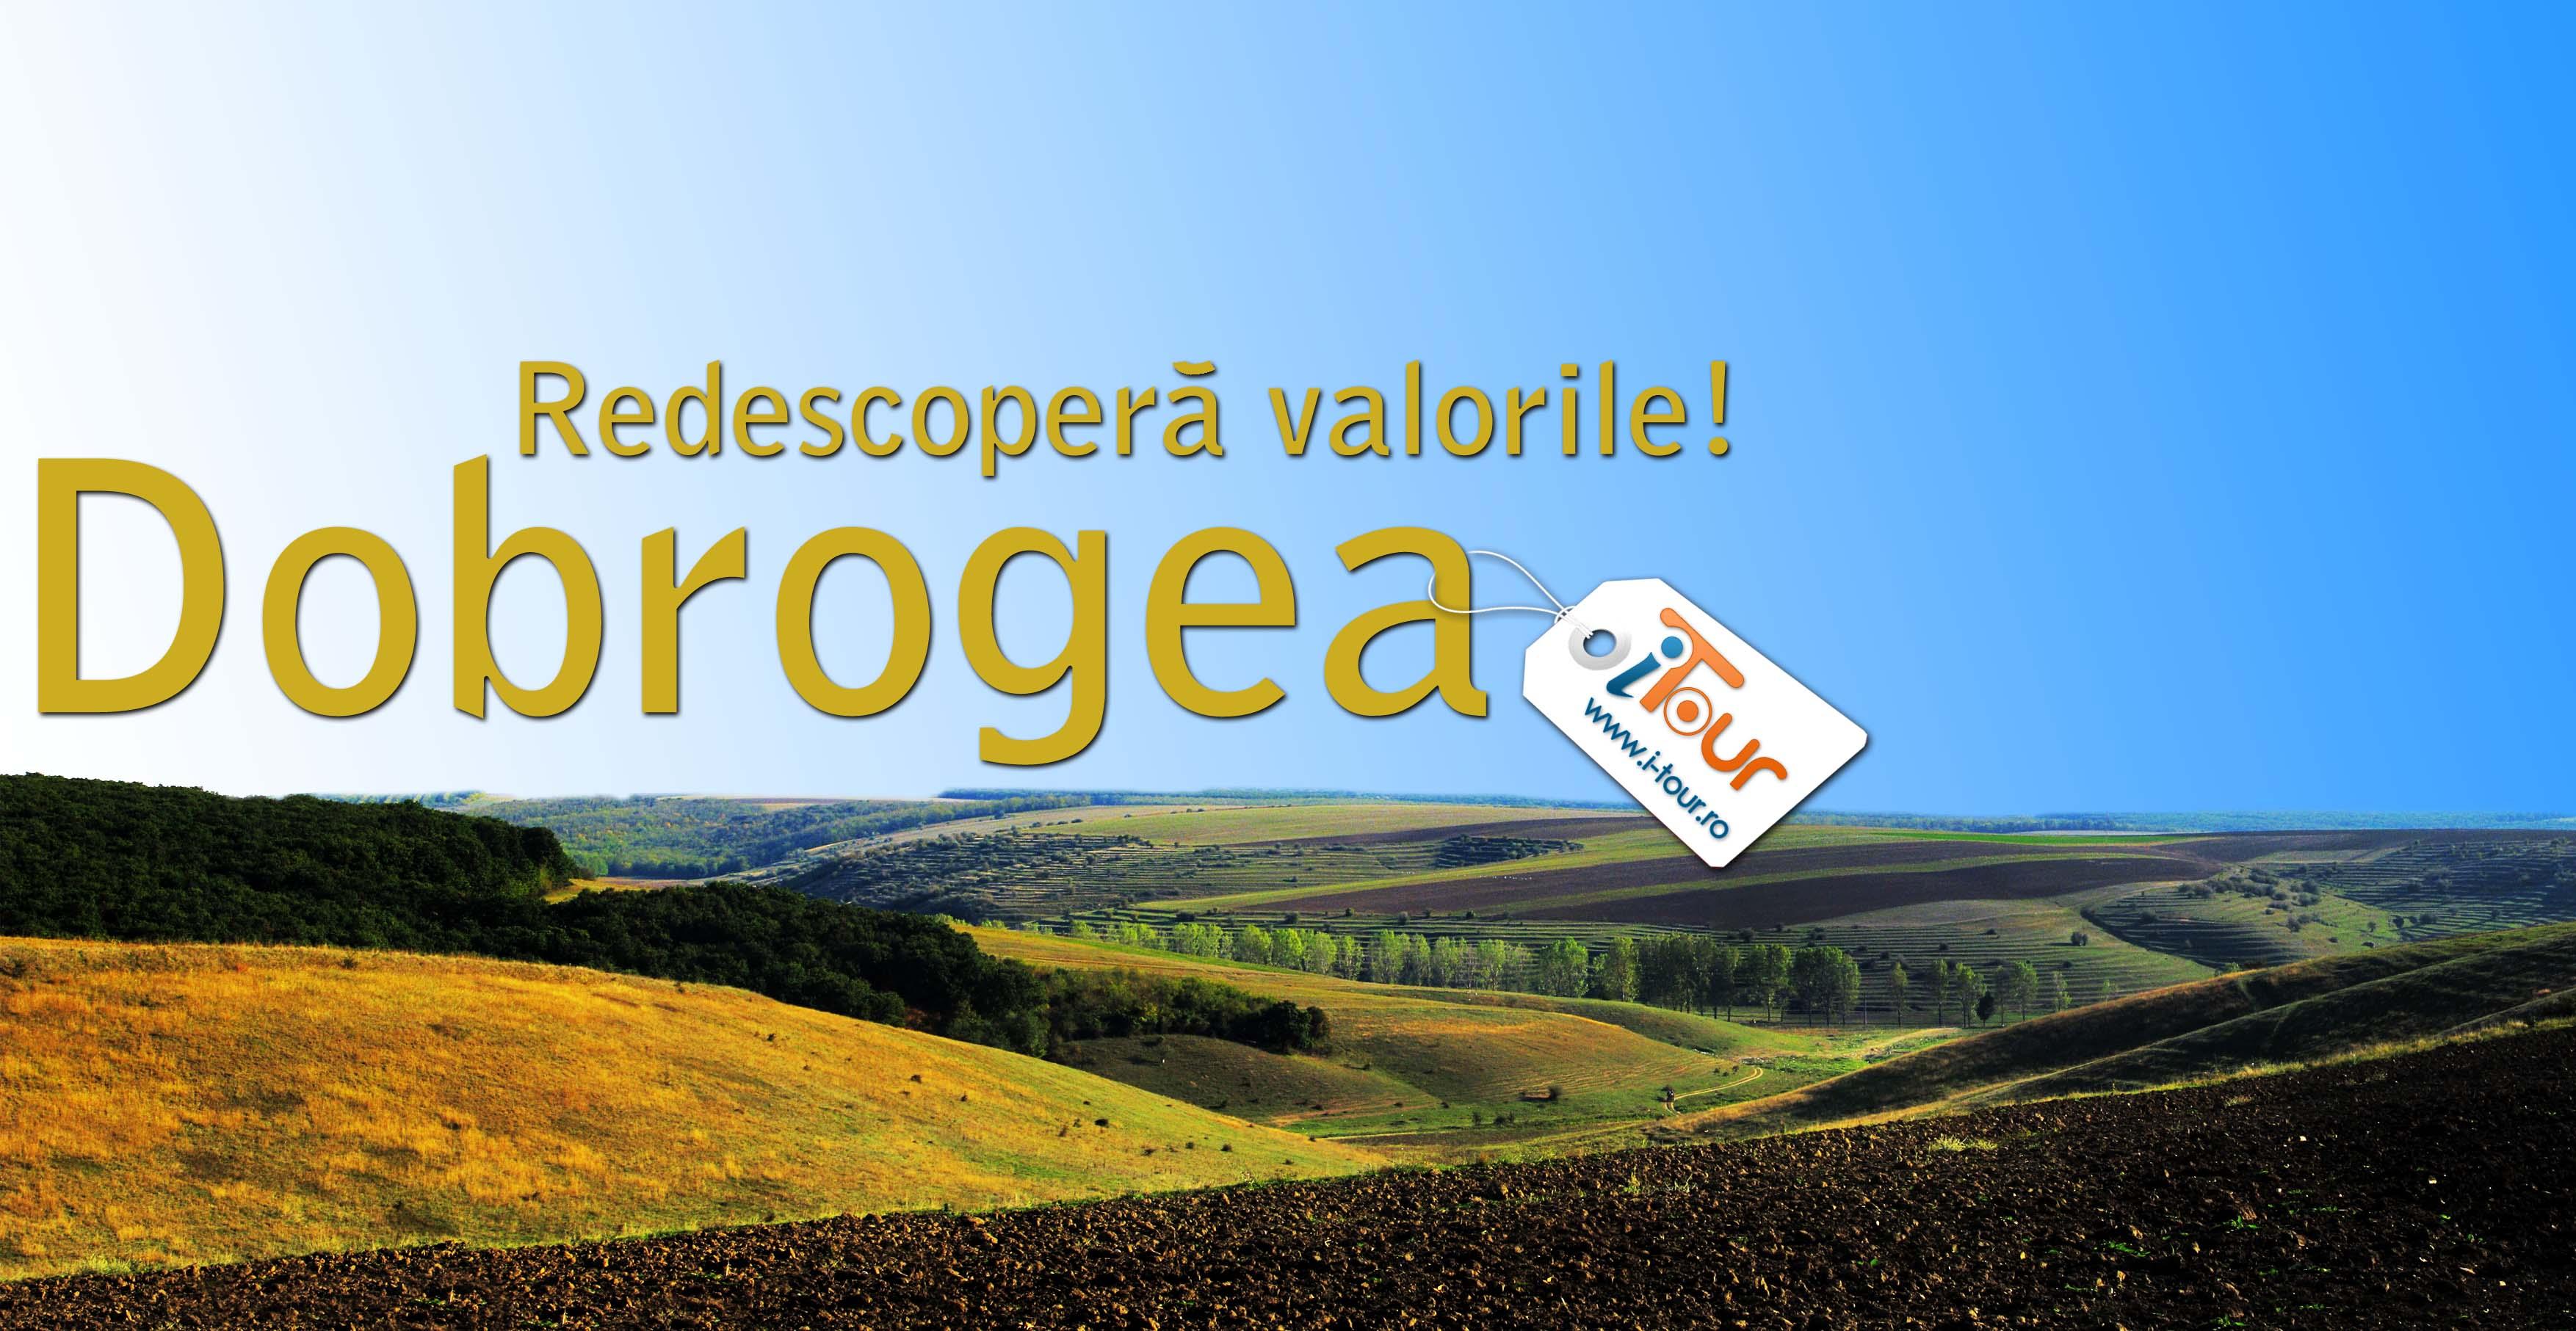 Redescopera valorile Dobrogea